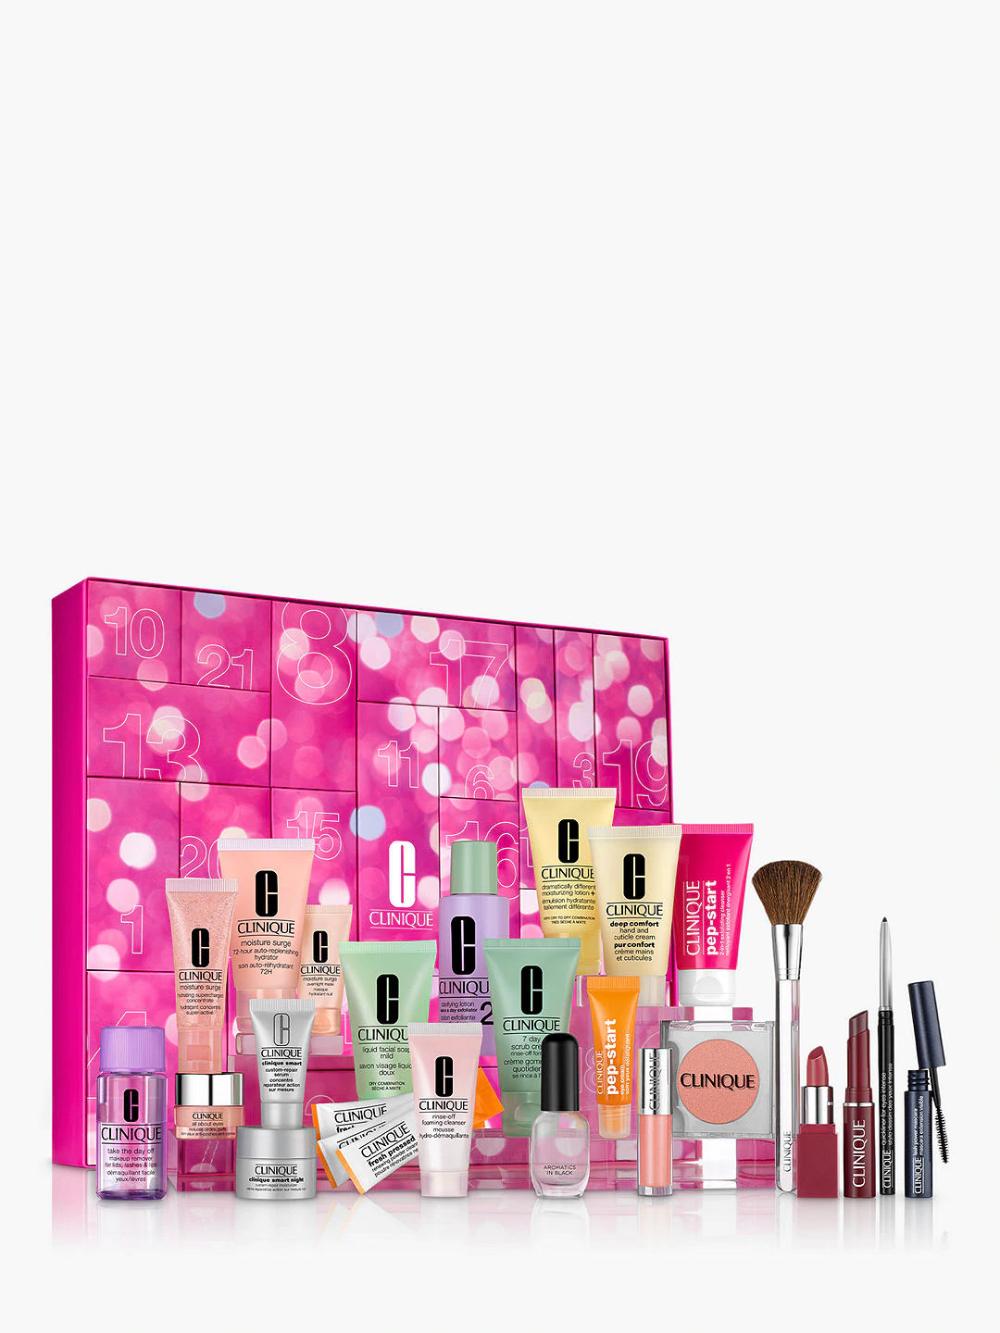 Clinique 24 Days of Clinique Beauty Advent Calendar